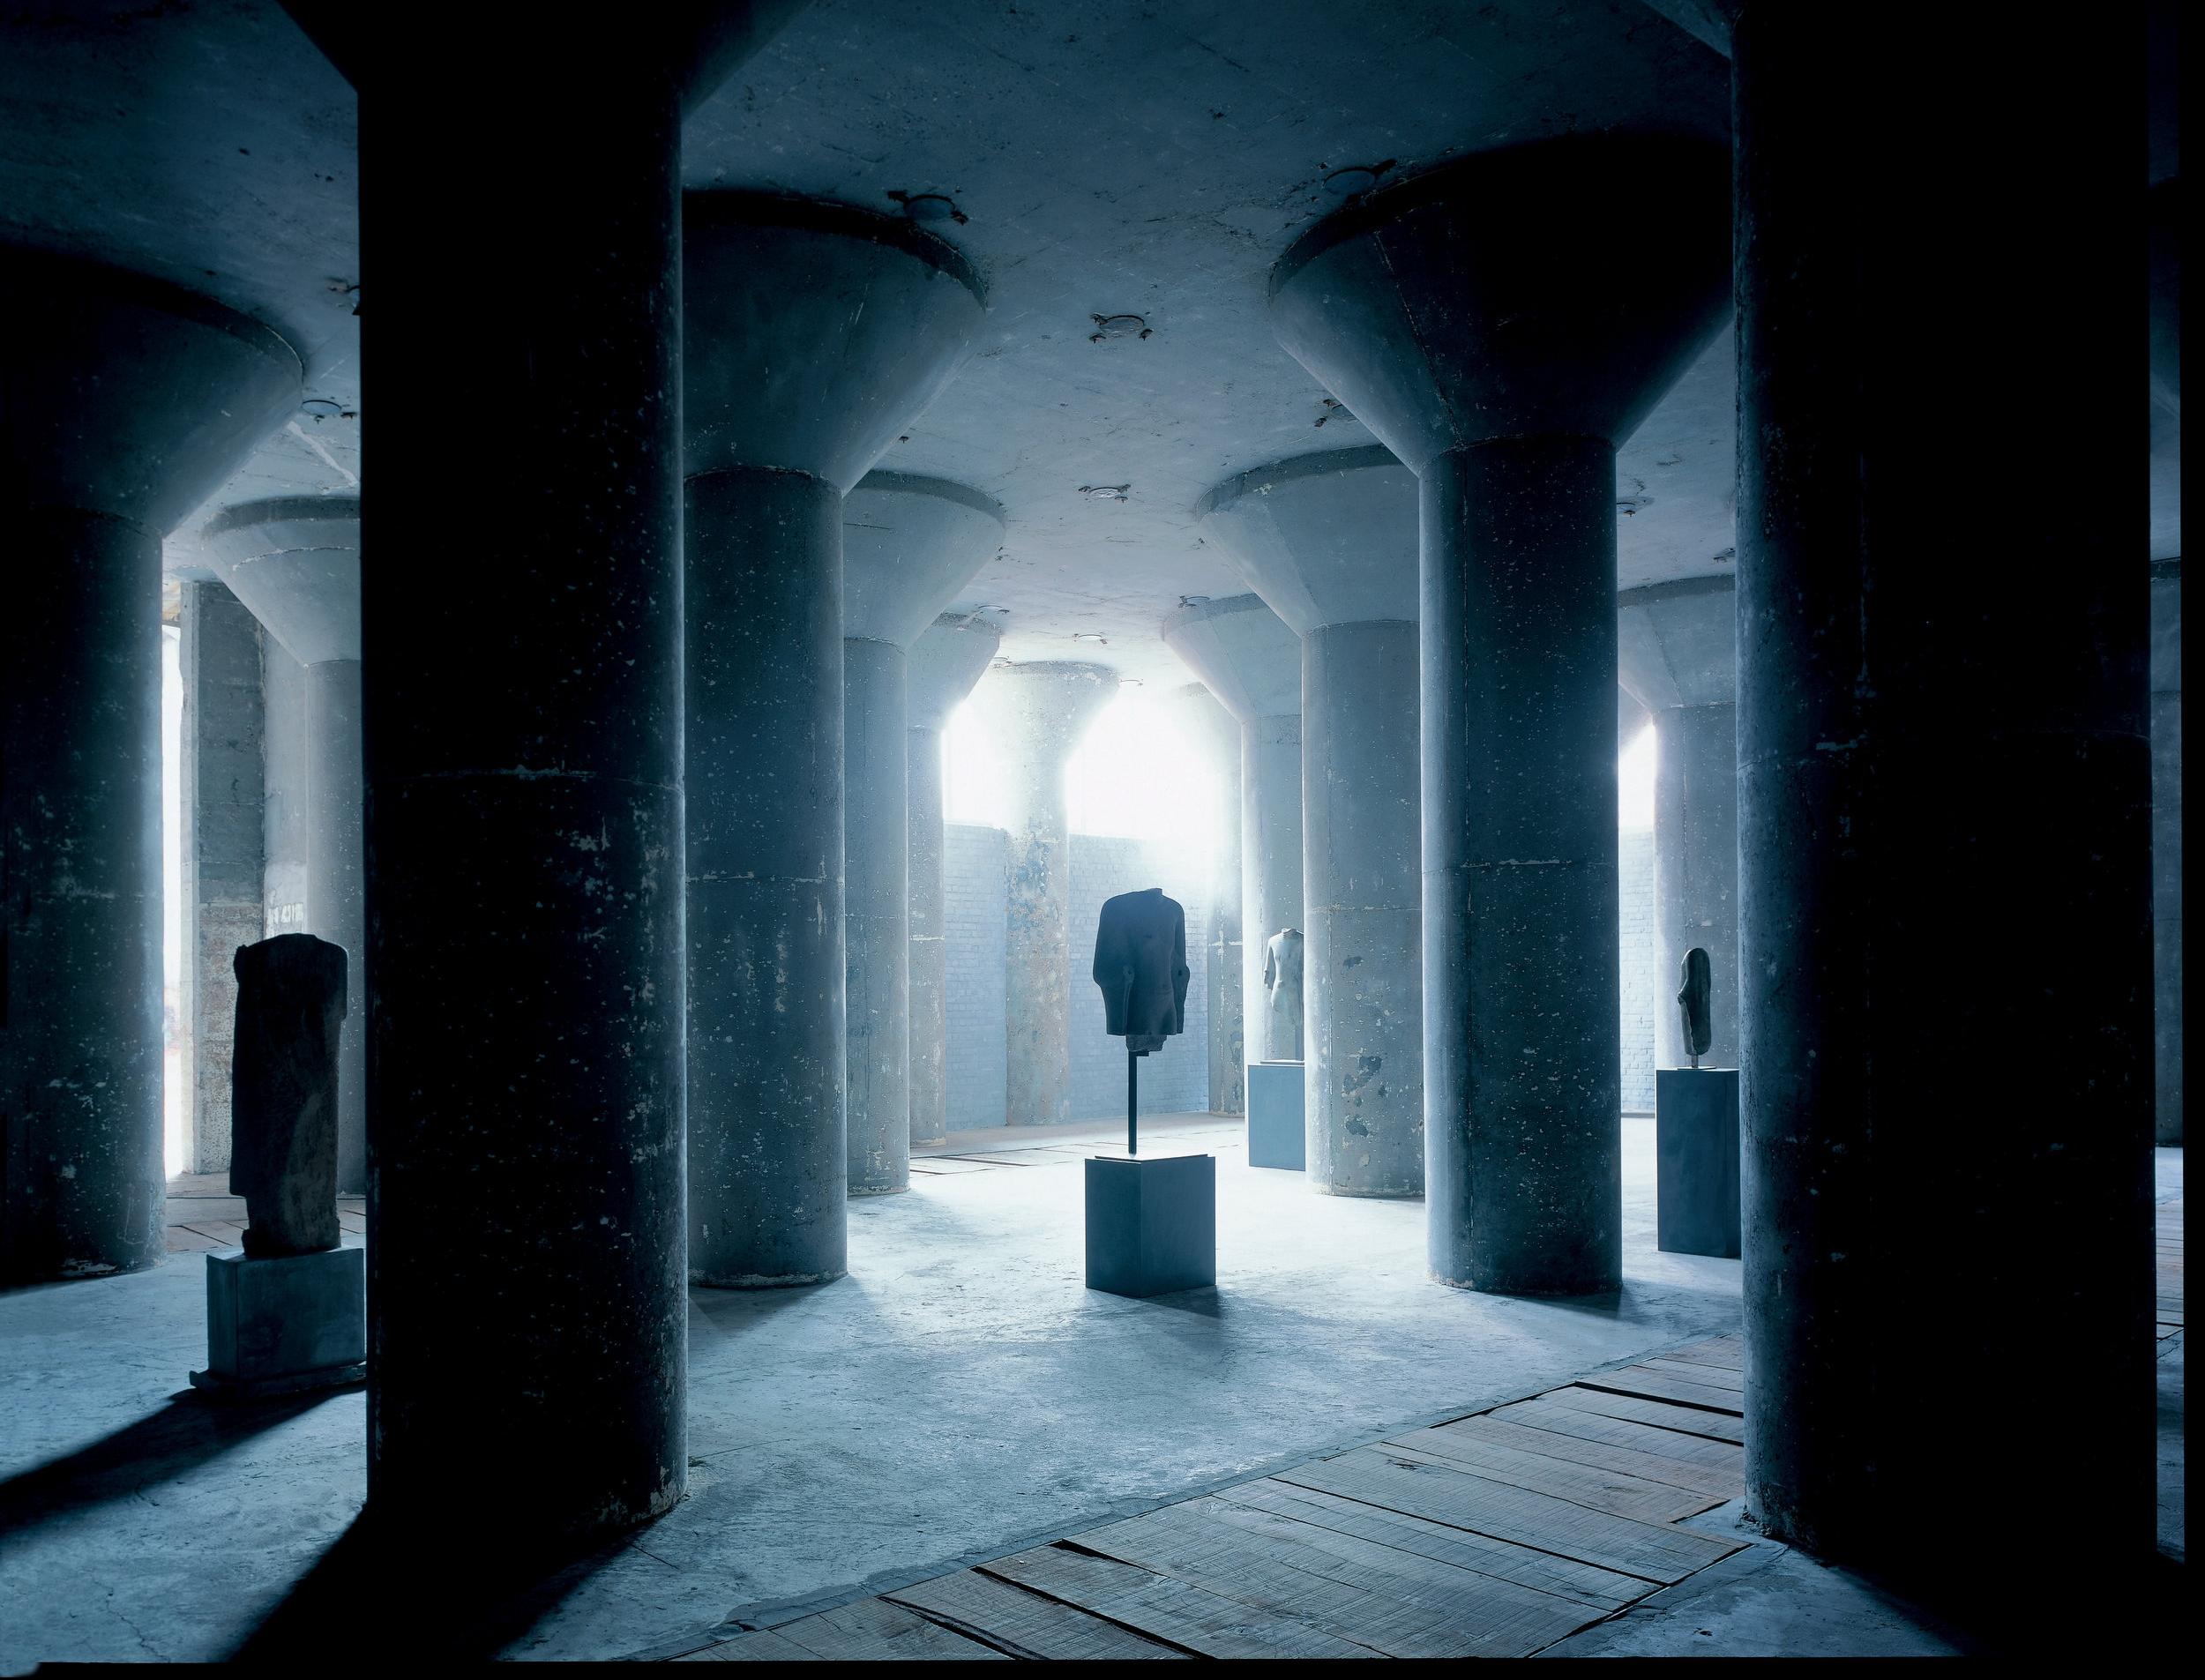 Karnak  © Laziz Hamani / Courtoisie Axel & May Vervoordt Foundation